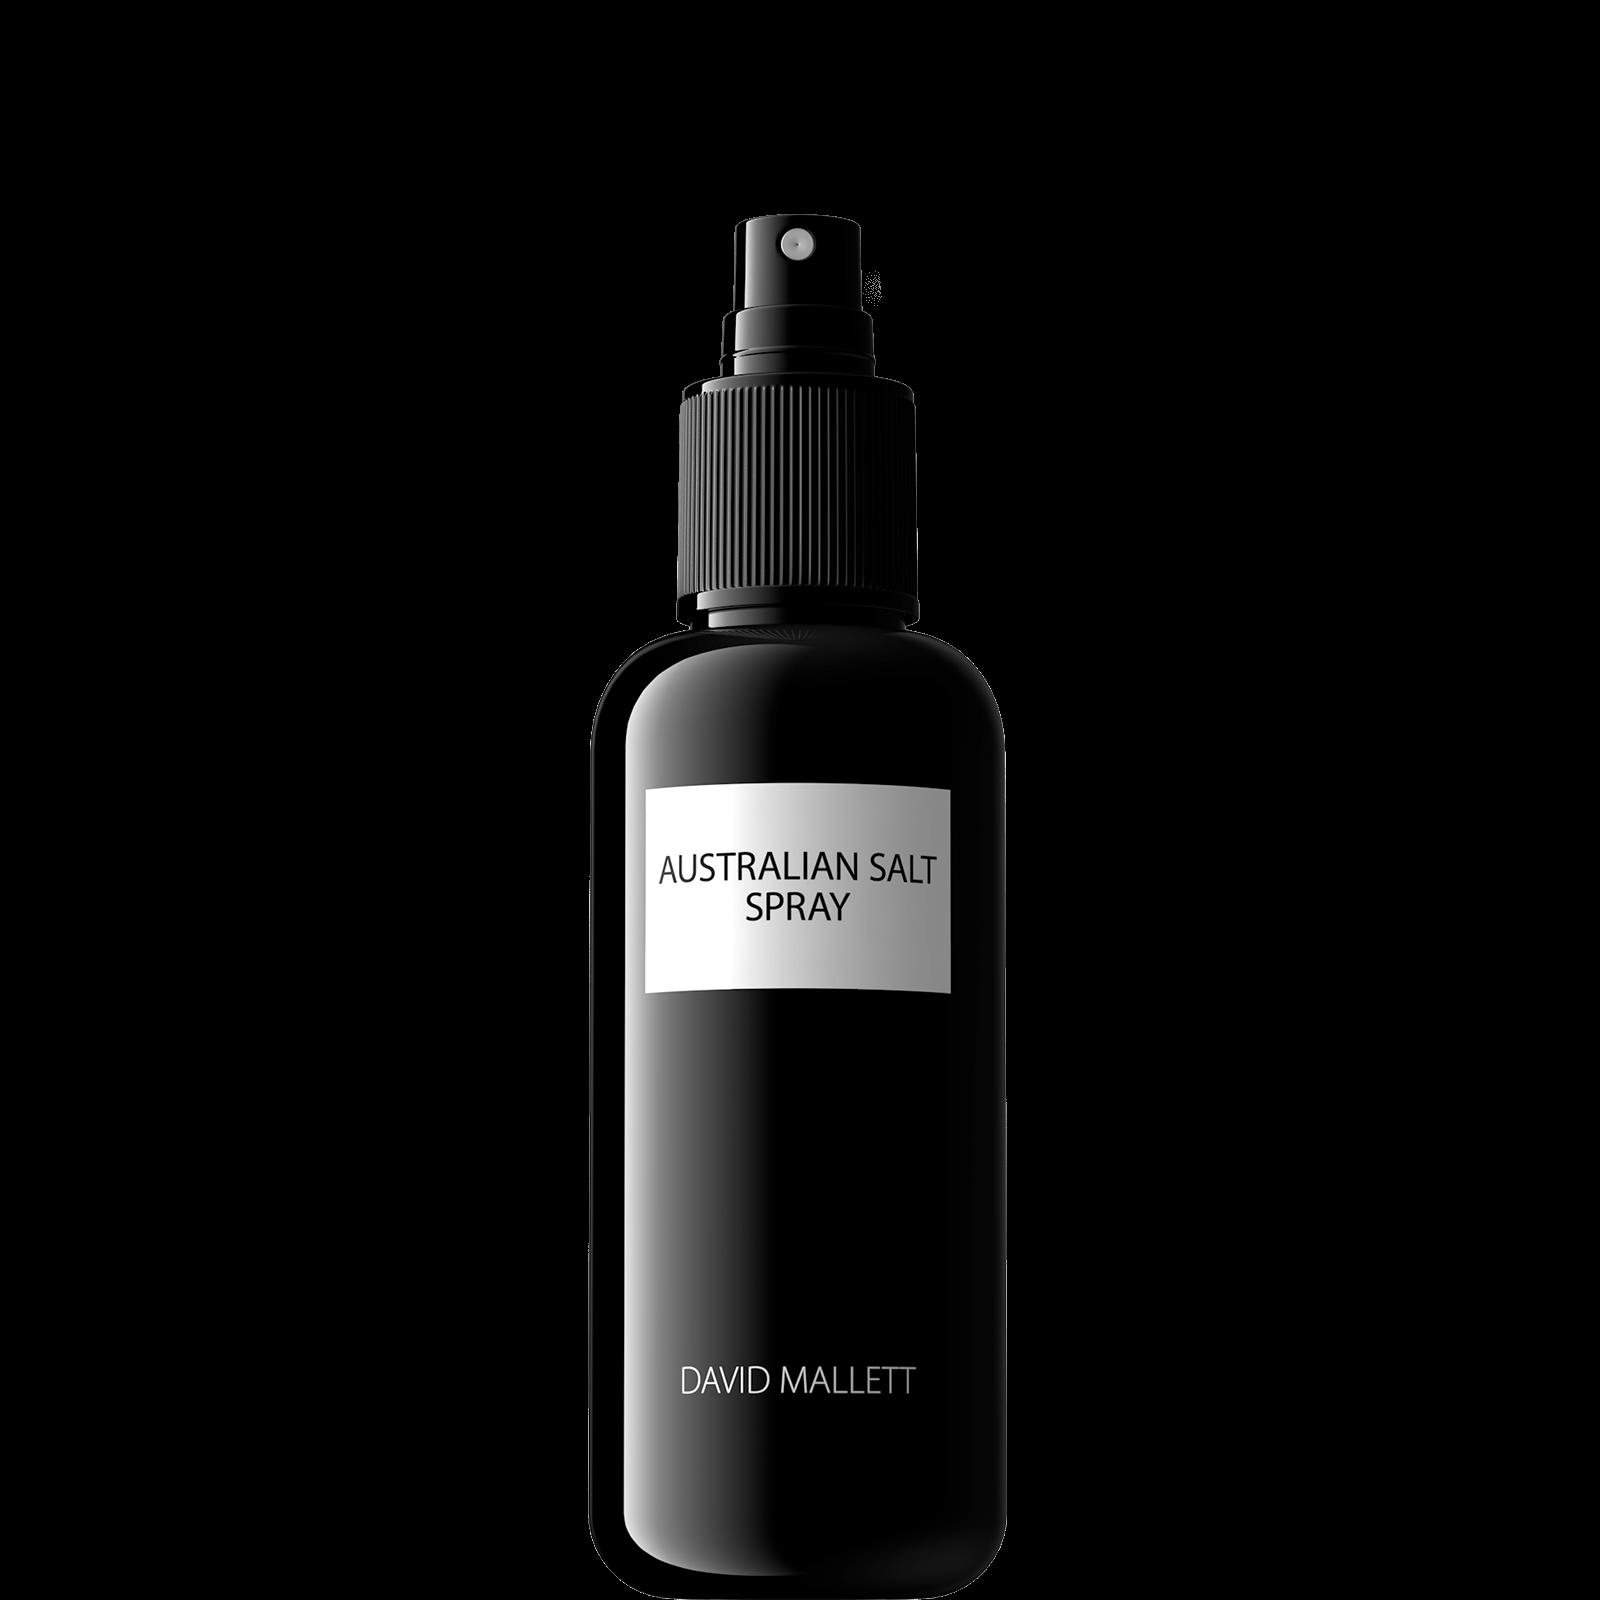 Image produit: Australian Salt Spray